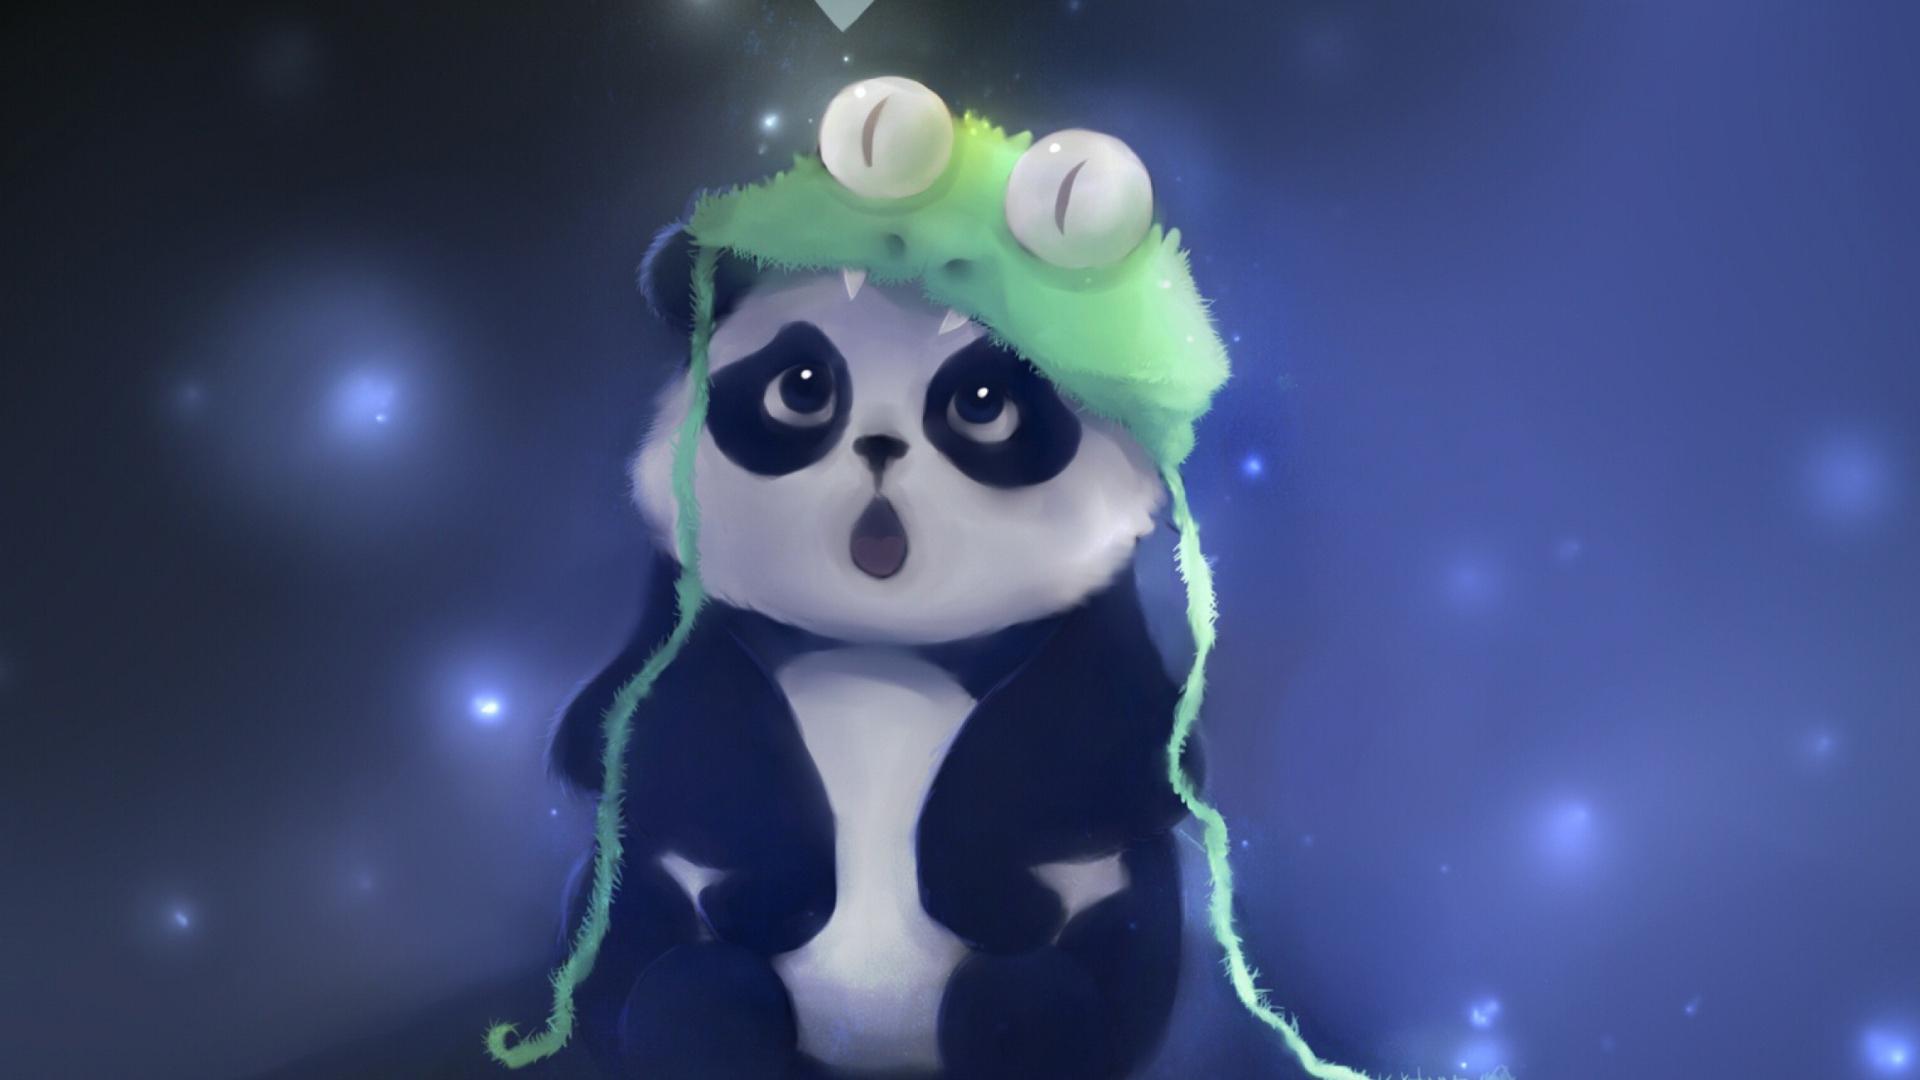 Free Download Cute Baby Panda Painting 19201200 Baby Panda Wallpaper Images 1920x1200 For Your Desktop Mobile Tablet Explore 48 Cute Baby Panda Wallpaper Panda Bear Wallpaper Baby Pandas Wallpaper Kawaii Panda Wallpaper